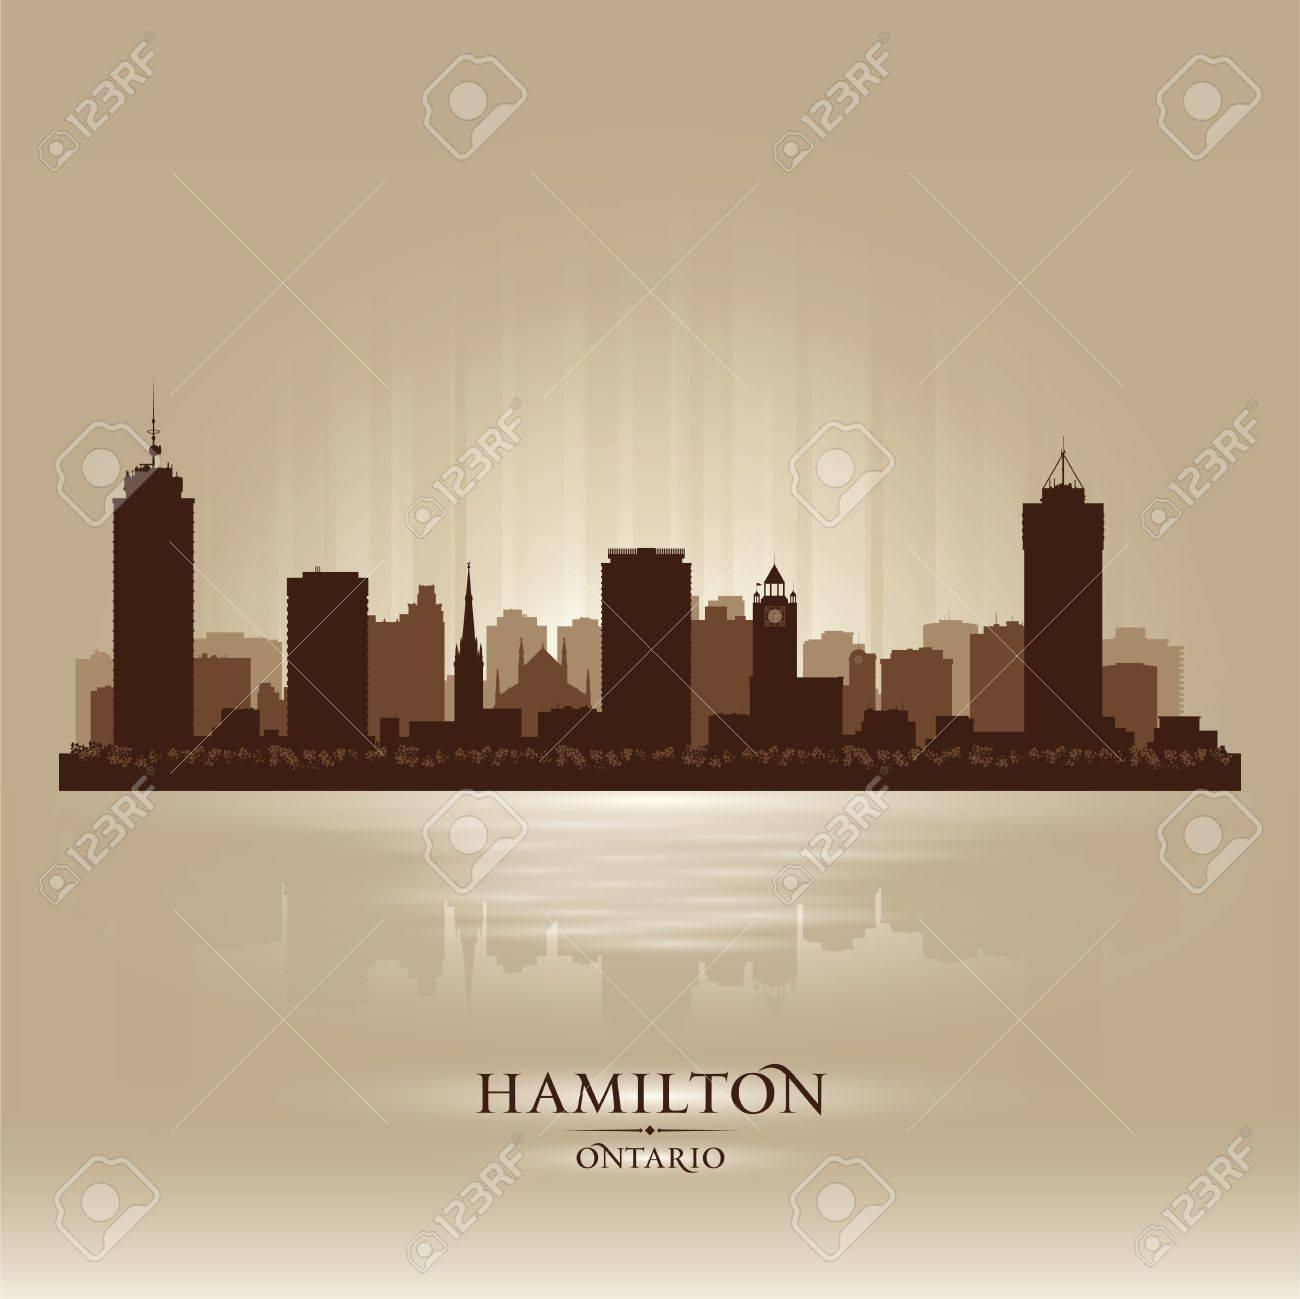 Hamilton Canada skyline city silhouette illustration Stock Vector - 19719977